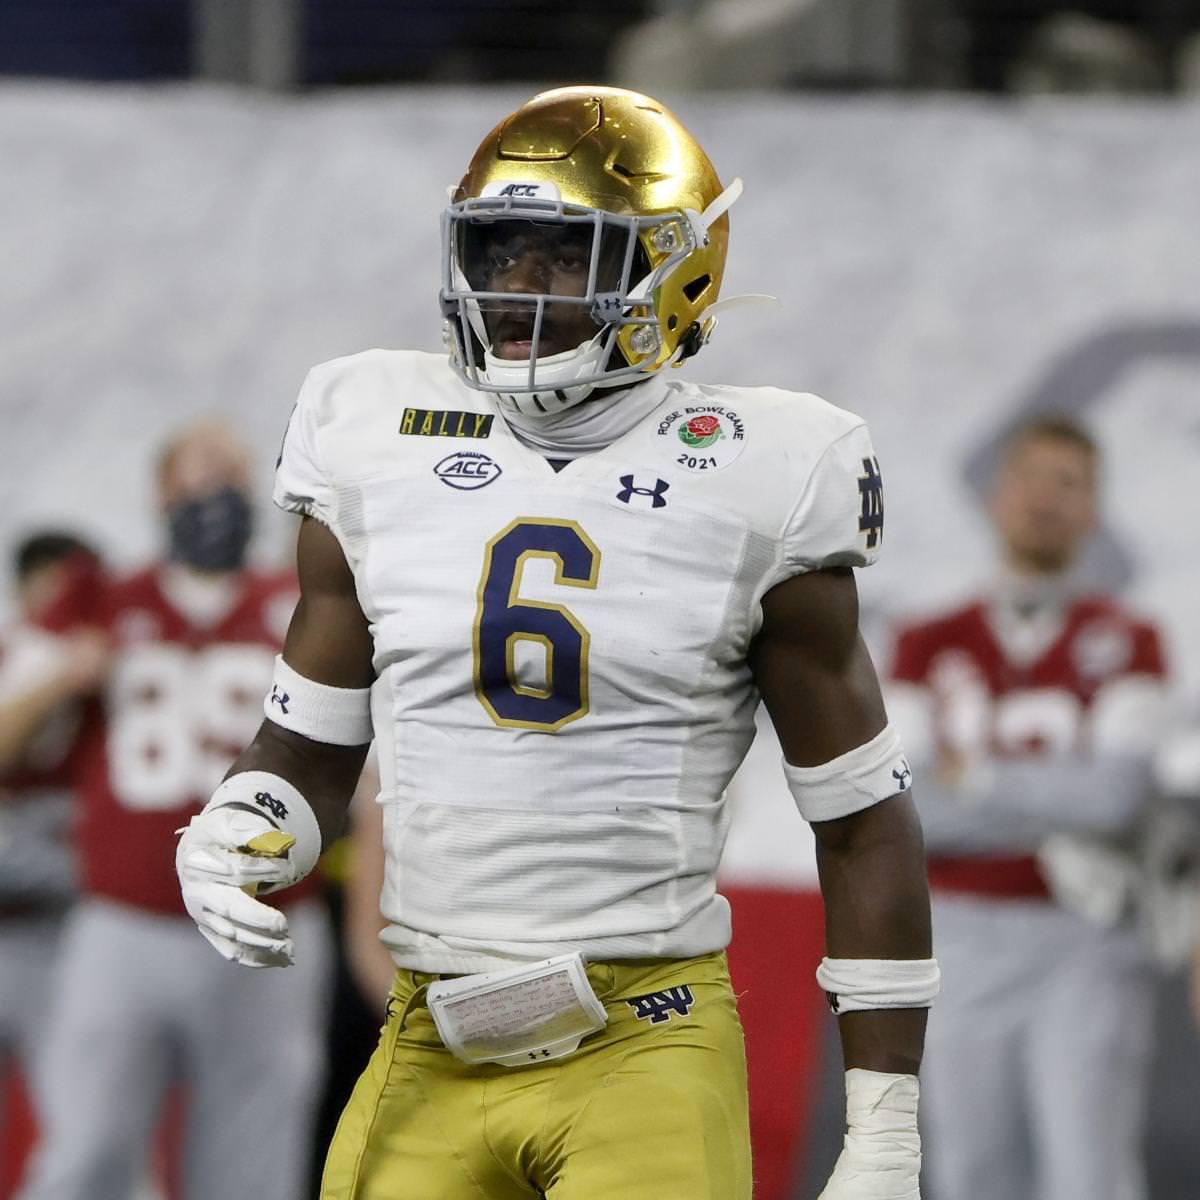 Jeremiah Owusu-Koramoah, da Notre Dame, declara o Draft de 2021 da NFL